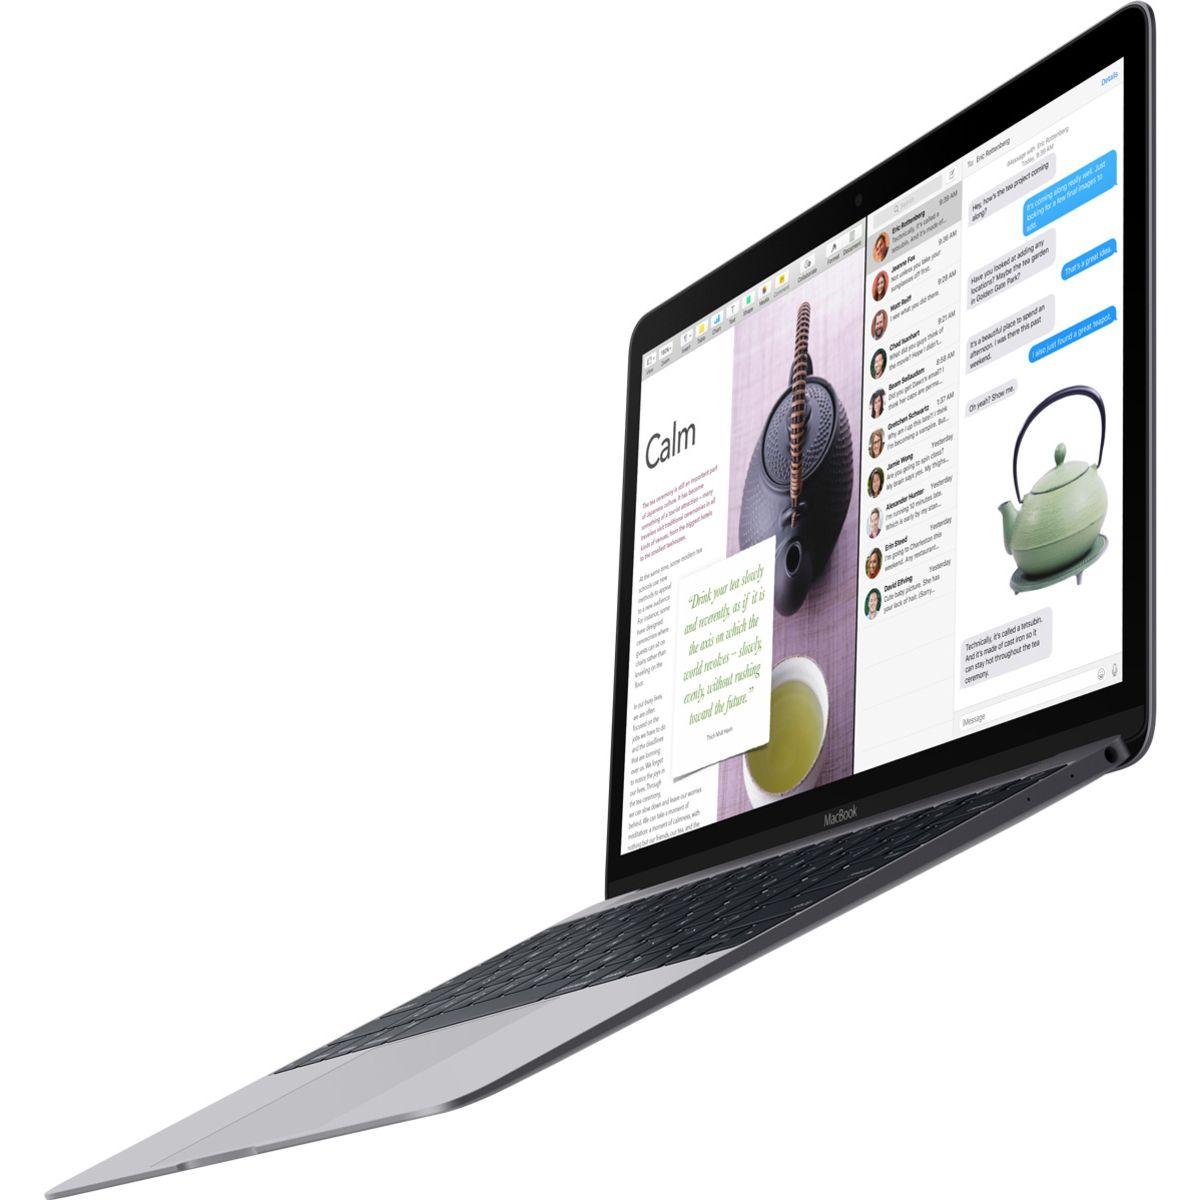 APPLE Ordinateur portable Macbook MNYG2FN/A - Gris sidéral